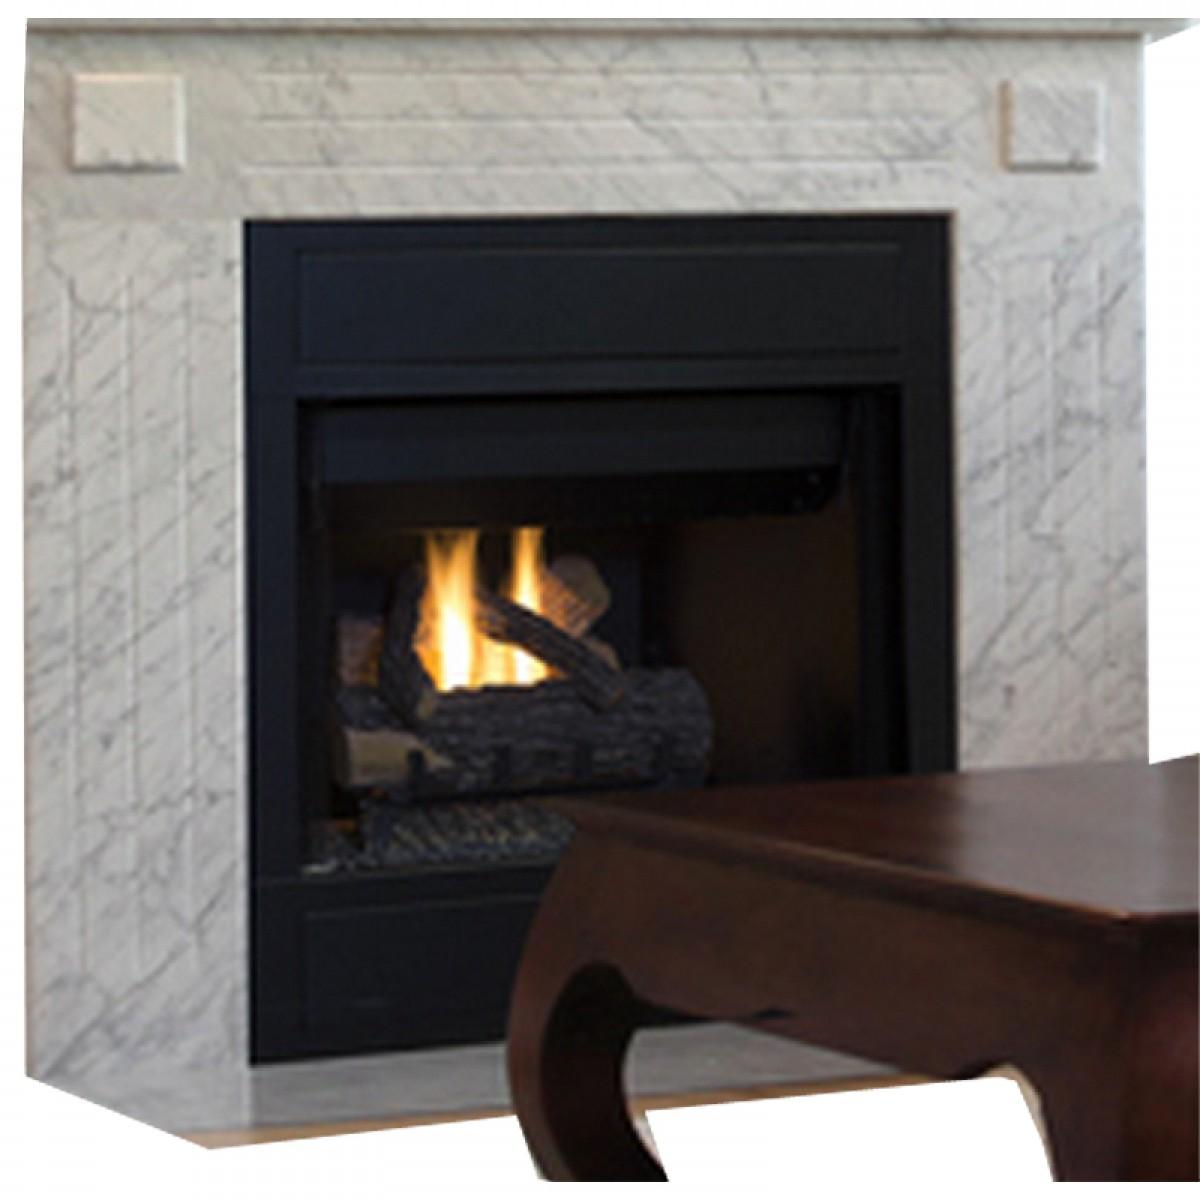 Ihp Superior Brt2032 Brt2332 Brt2532 B Vent Gas Fireplace